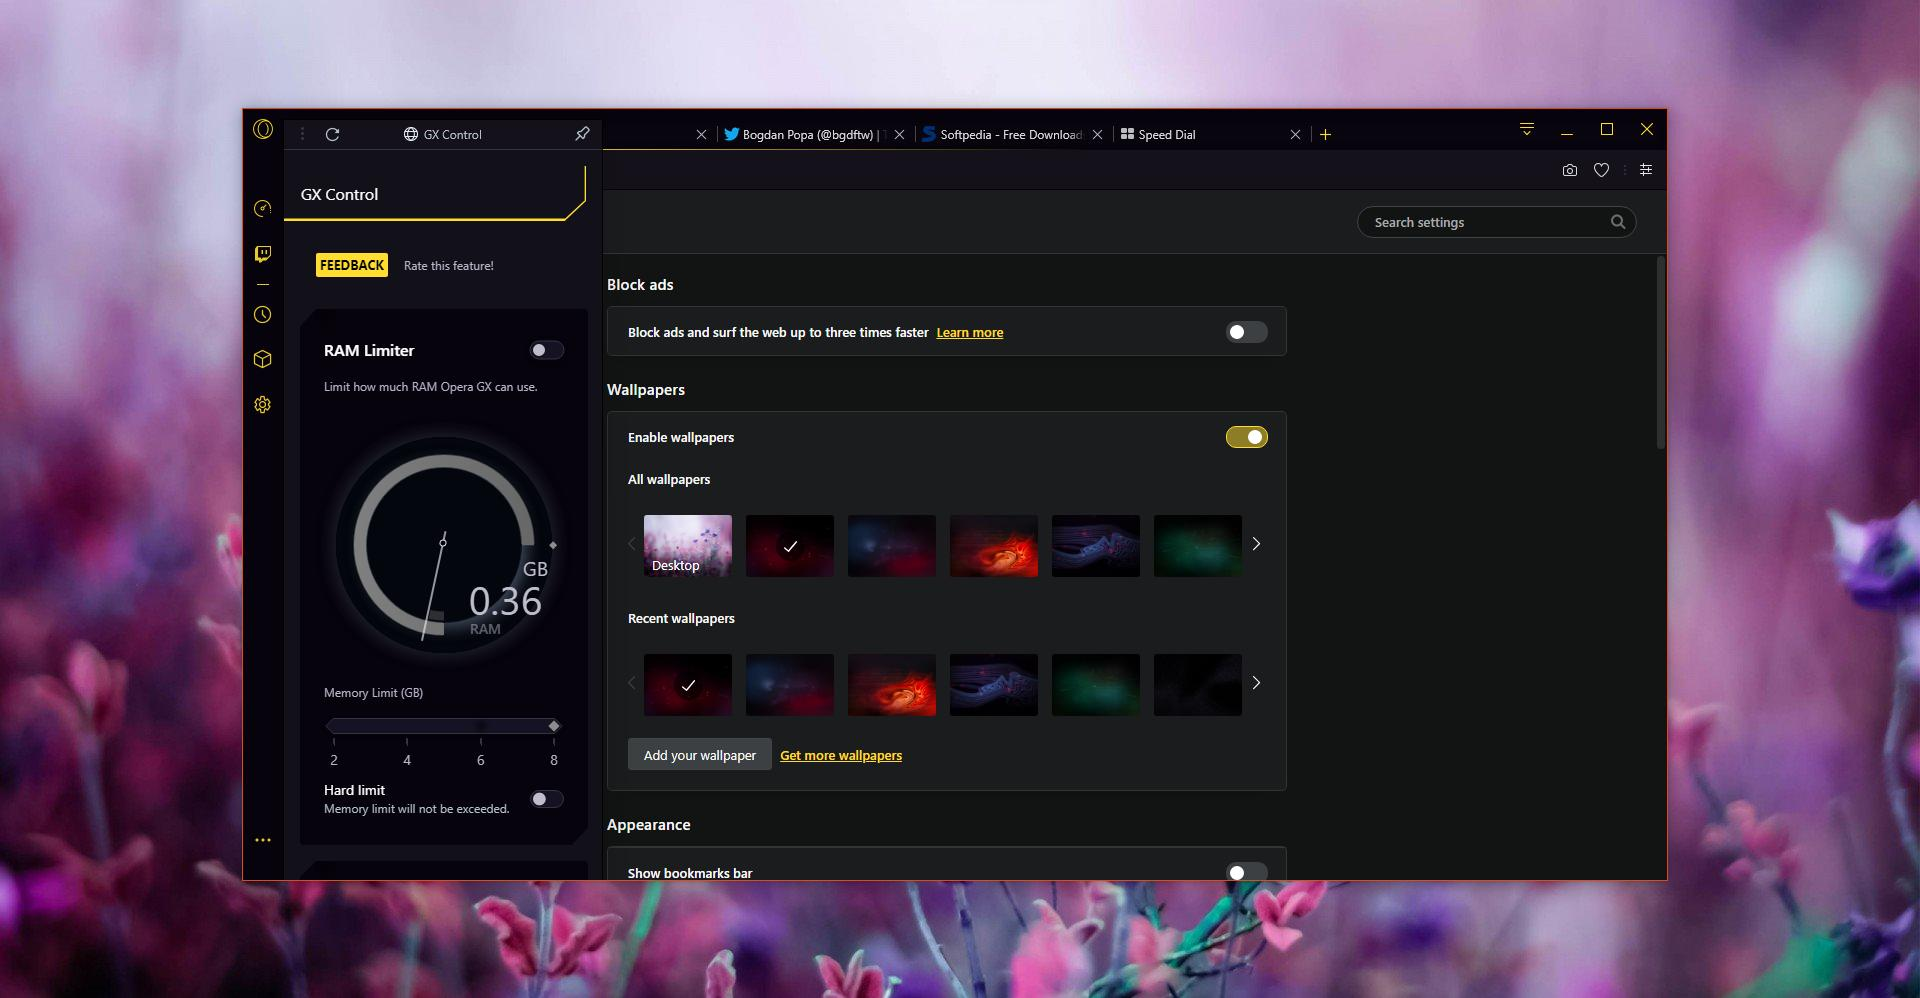 Opera GX: Tο πρώτο πρόγραμμα περιήγησης για gamers στον κόσμο Gettin11